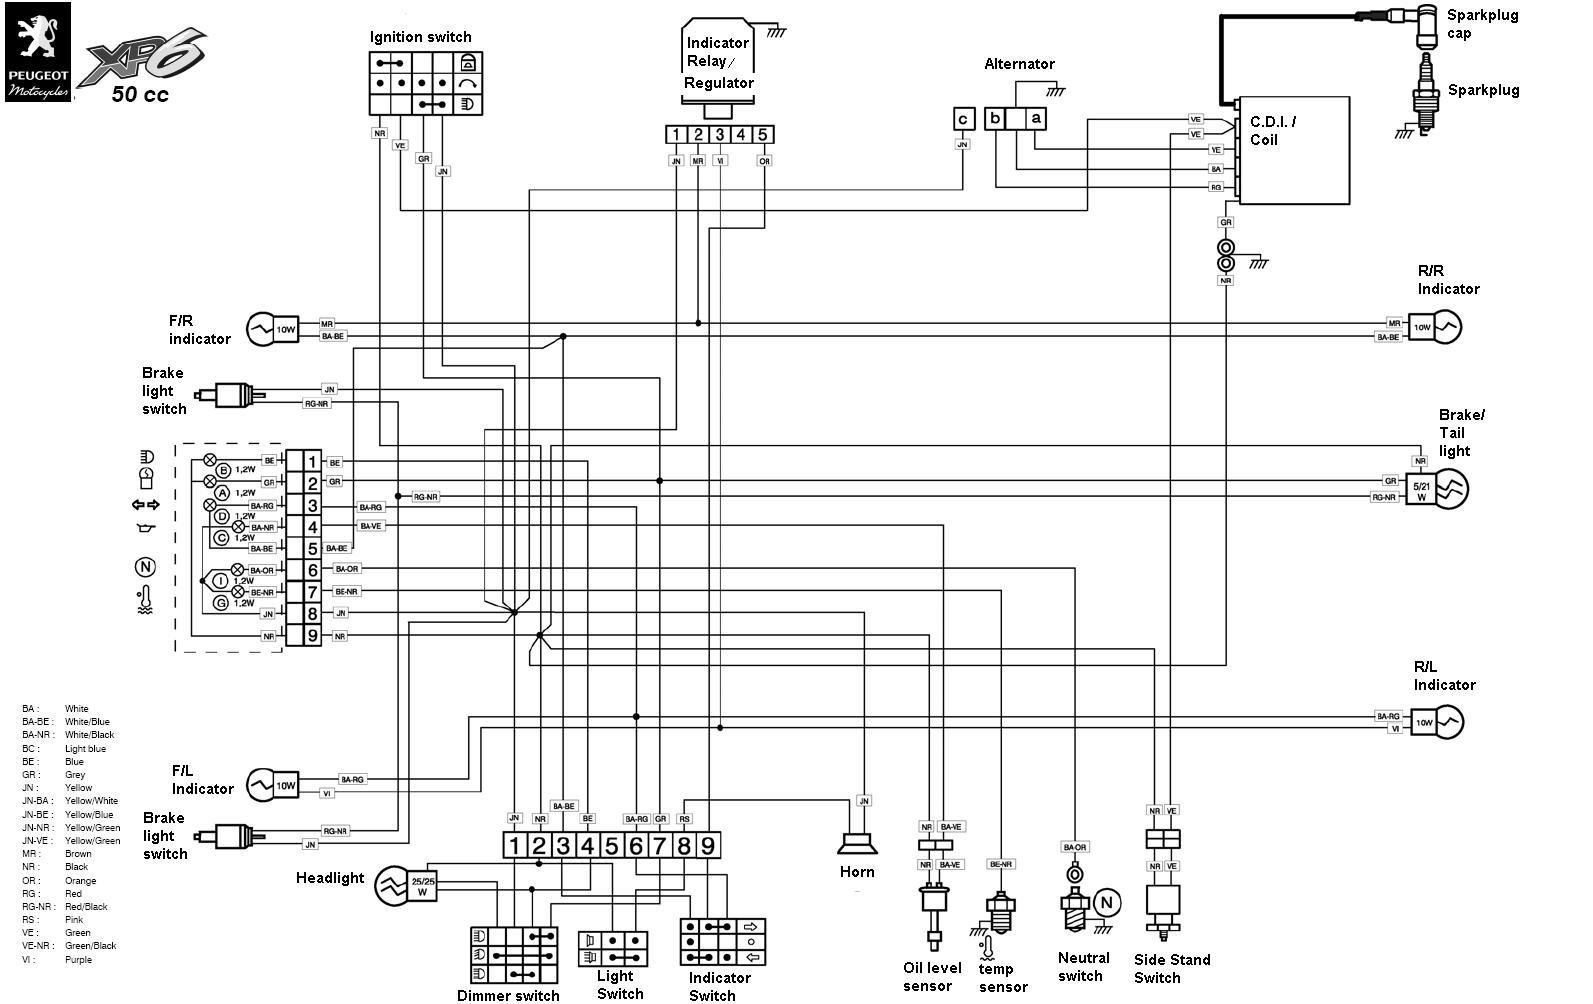 peugeot motorcycle manuals pdf wiring diagrams fault codes rh motorcycle manual com Tao Tao 50Cc Moped Wiring-Diagram 250Cc Scooter Wiring Diagram